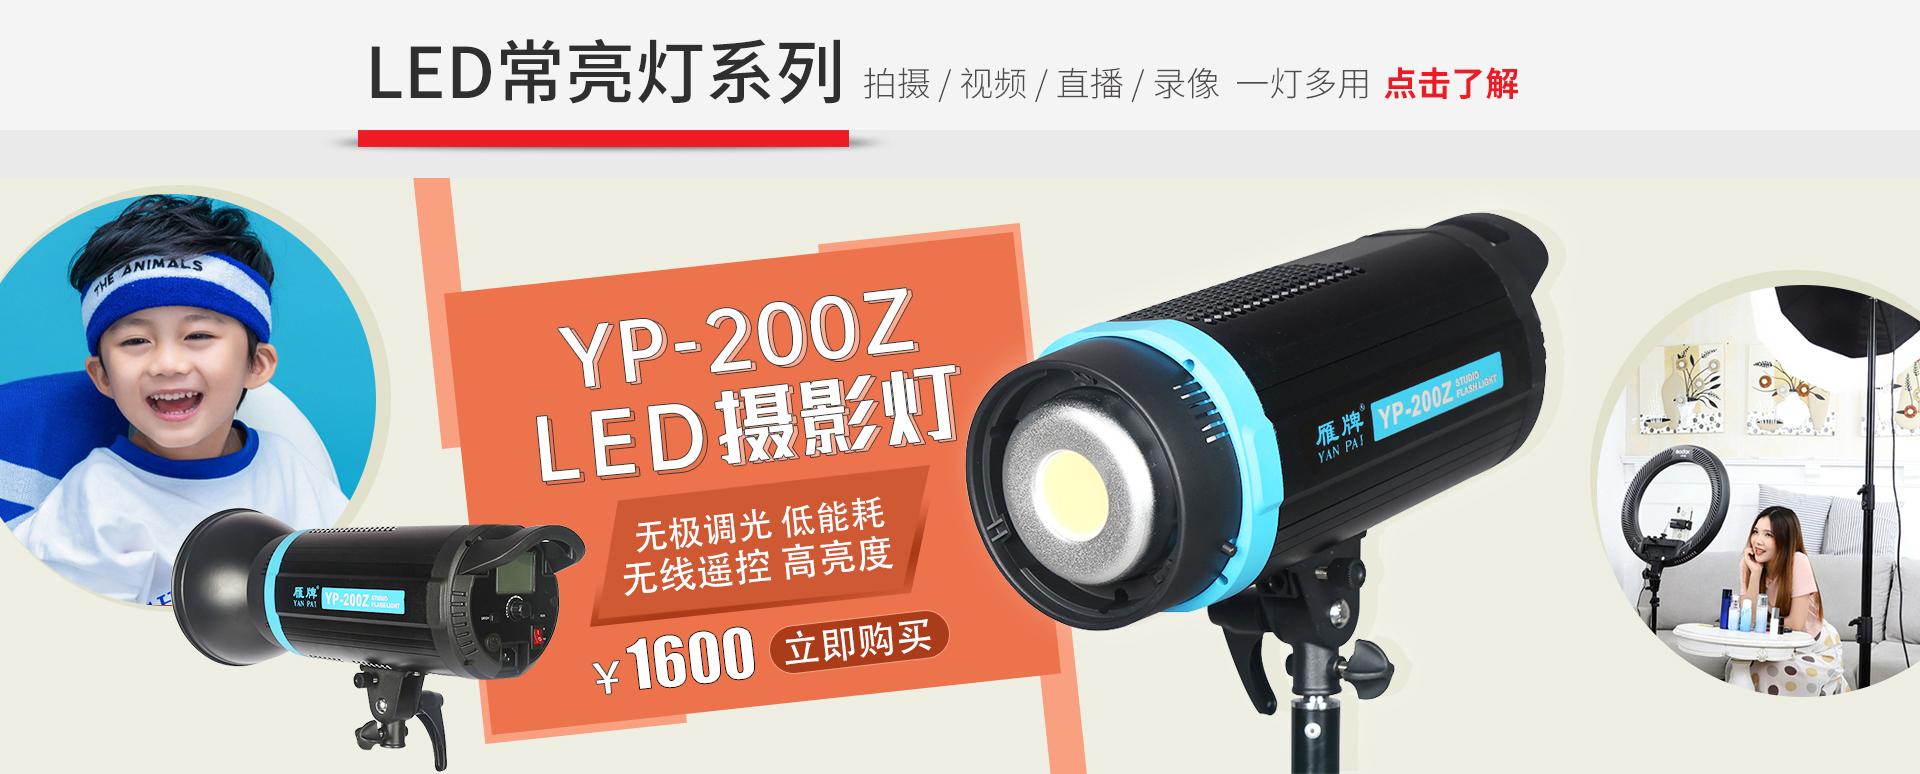 yp200-1.jpg